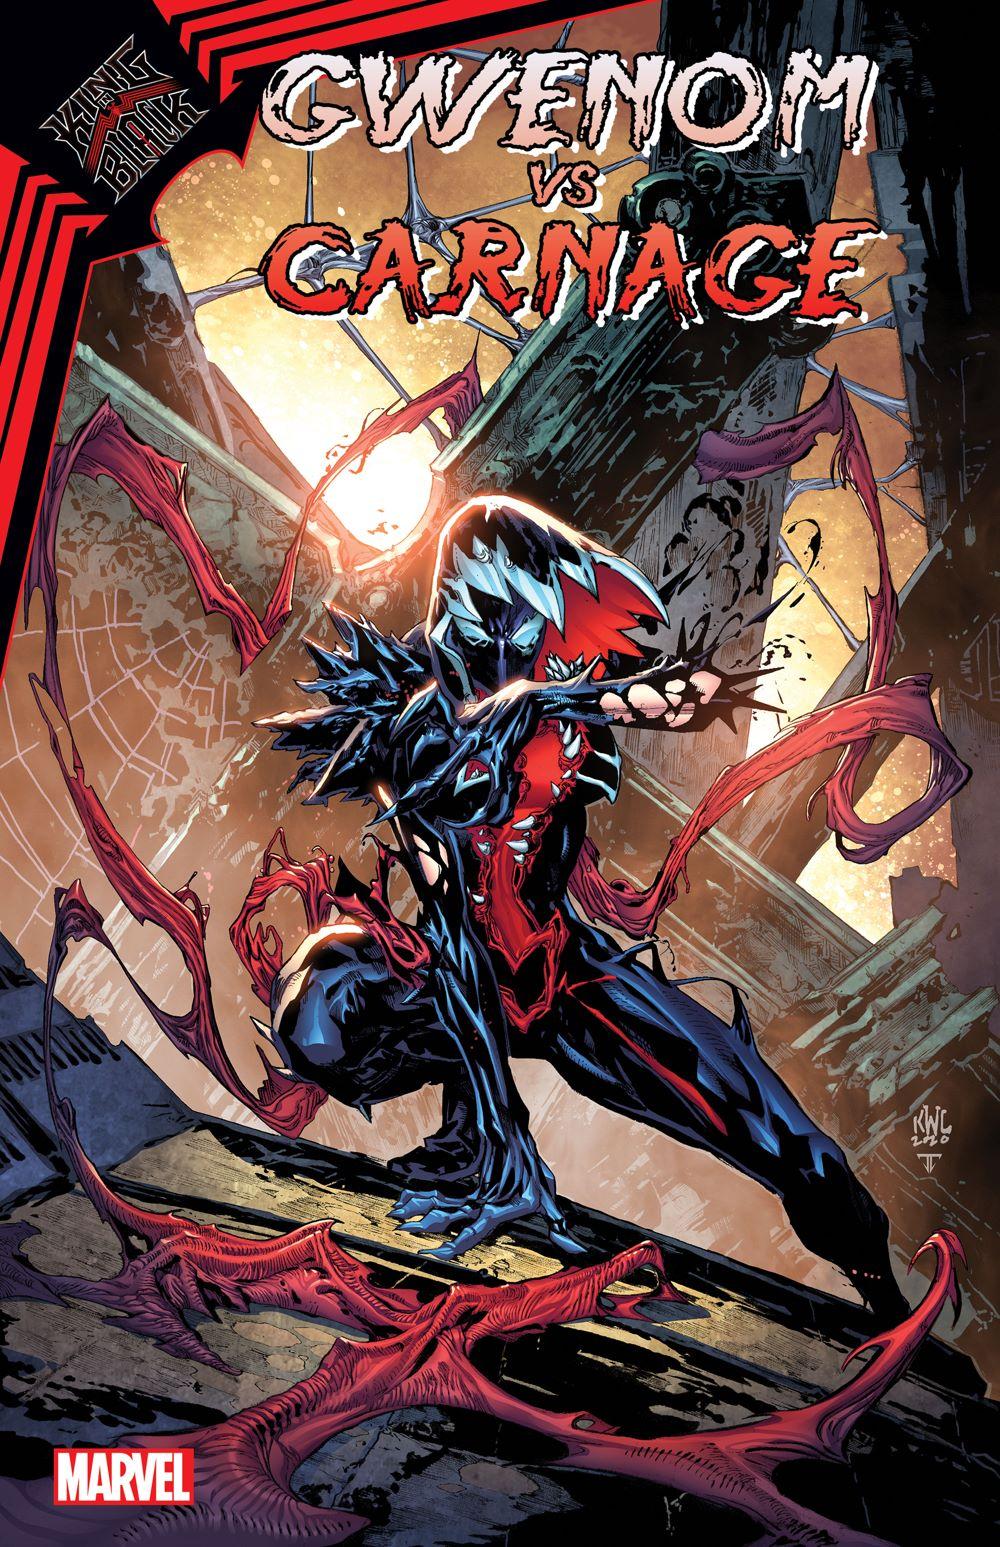 GWENOMVSCARN2020001_cov-5 Marvel Comics January 2021 Solicitations